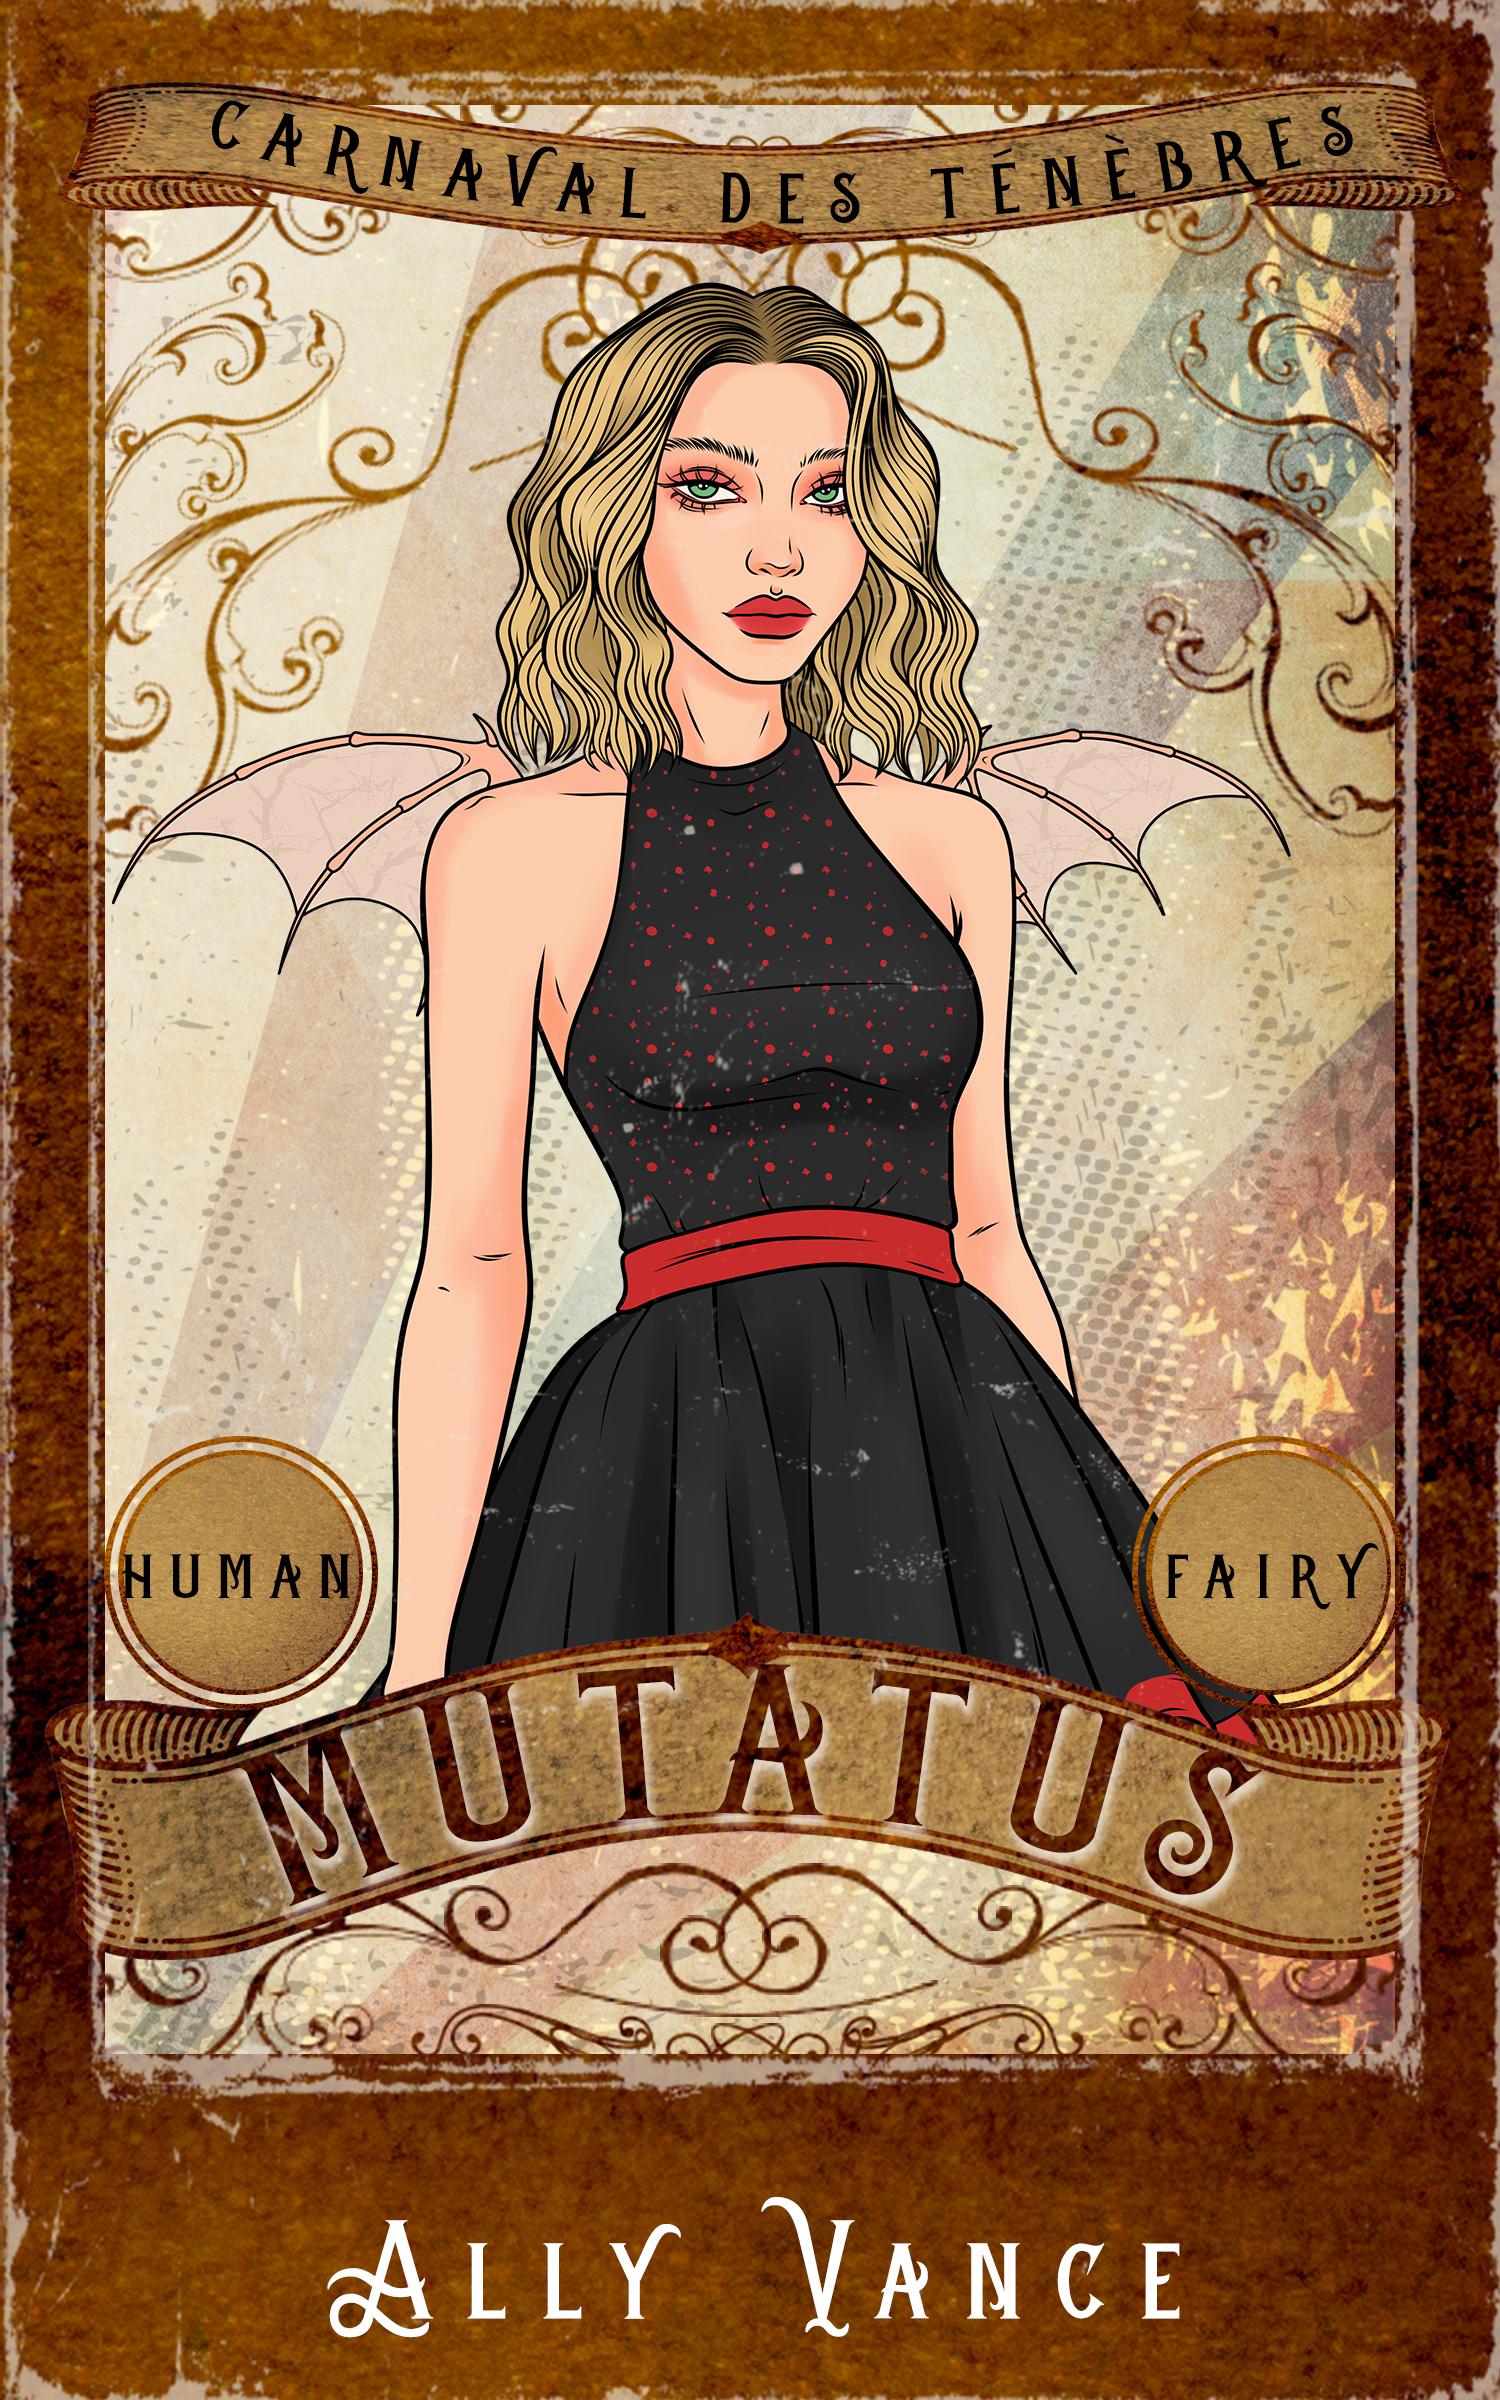 [PDF] [EPUB] Mutatus (Carnaval des Ténèbres, #3) Download by Ally Vance